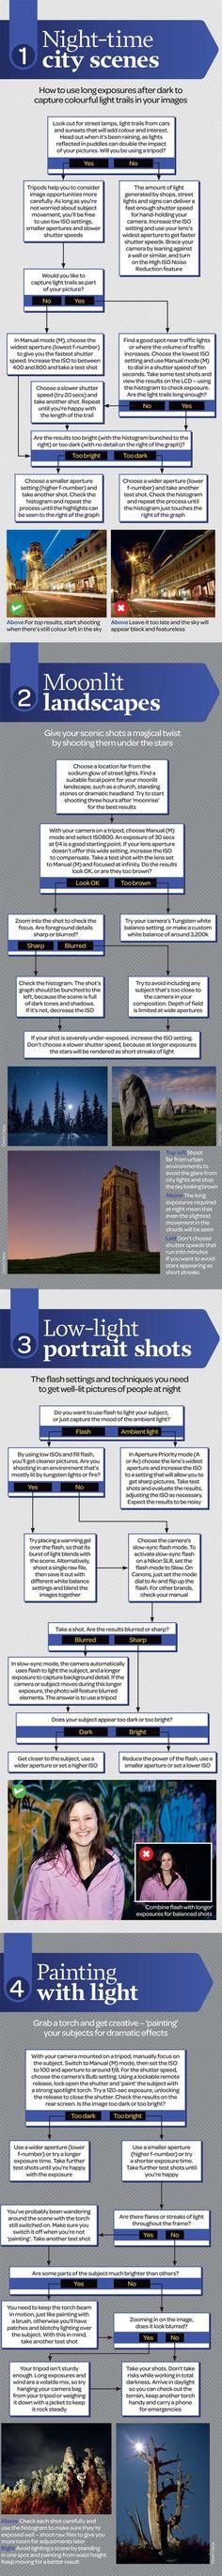 Free night photography cheat sheet: shoot any low-light scene by bleu.